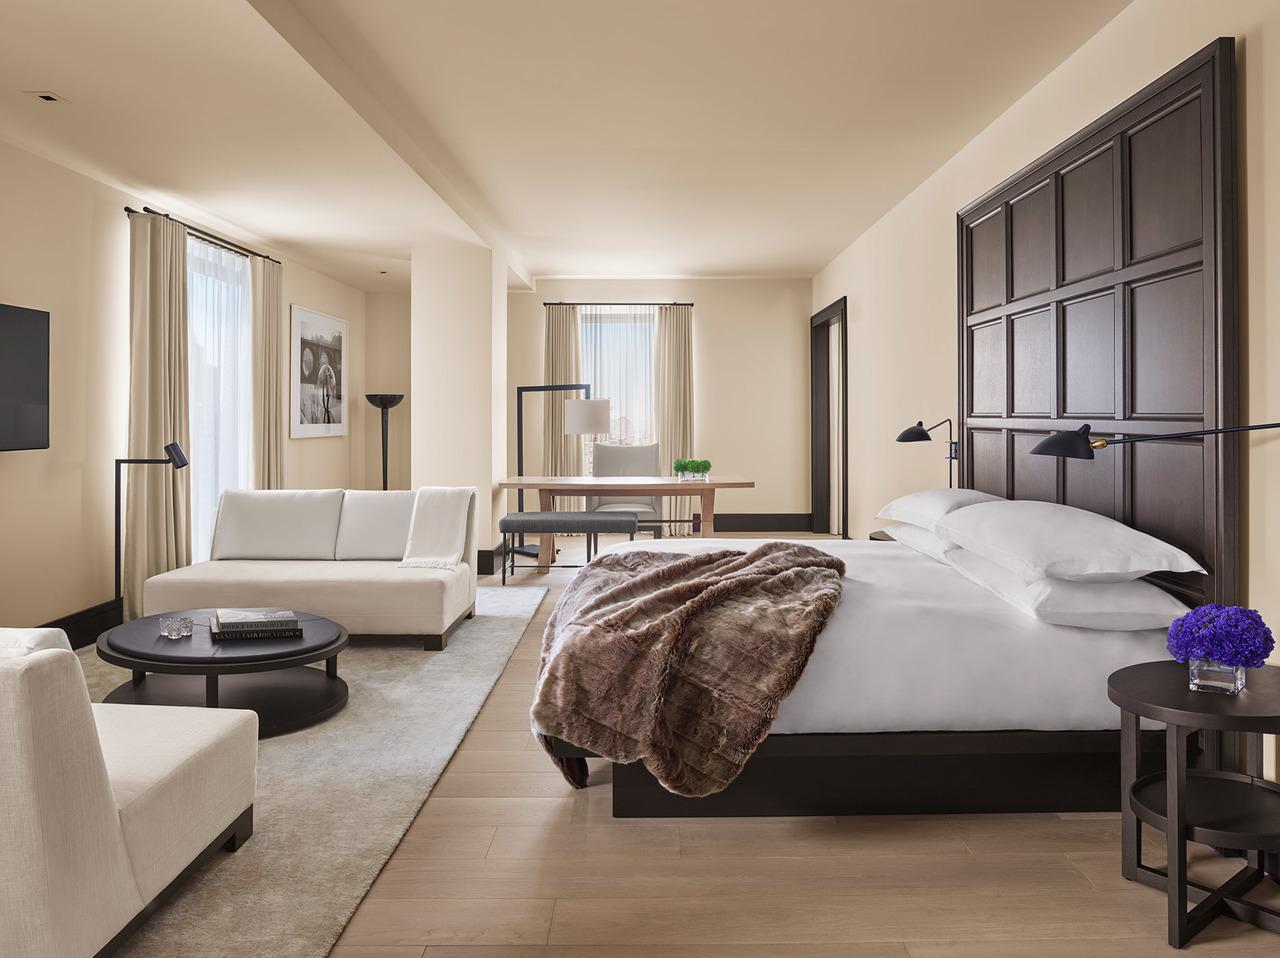 Madison-Suite-Bedroom-1870x1400-1.jpg